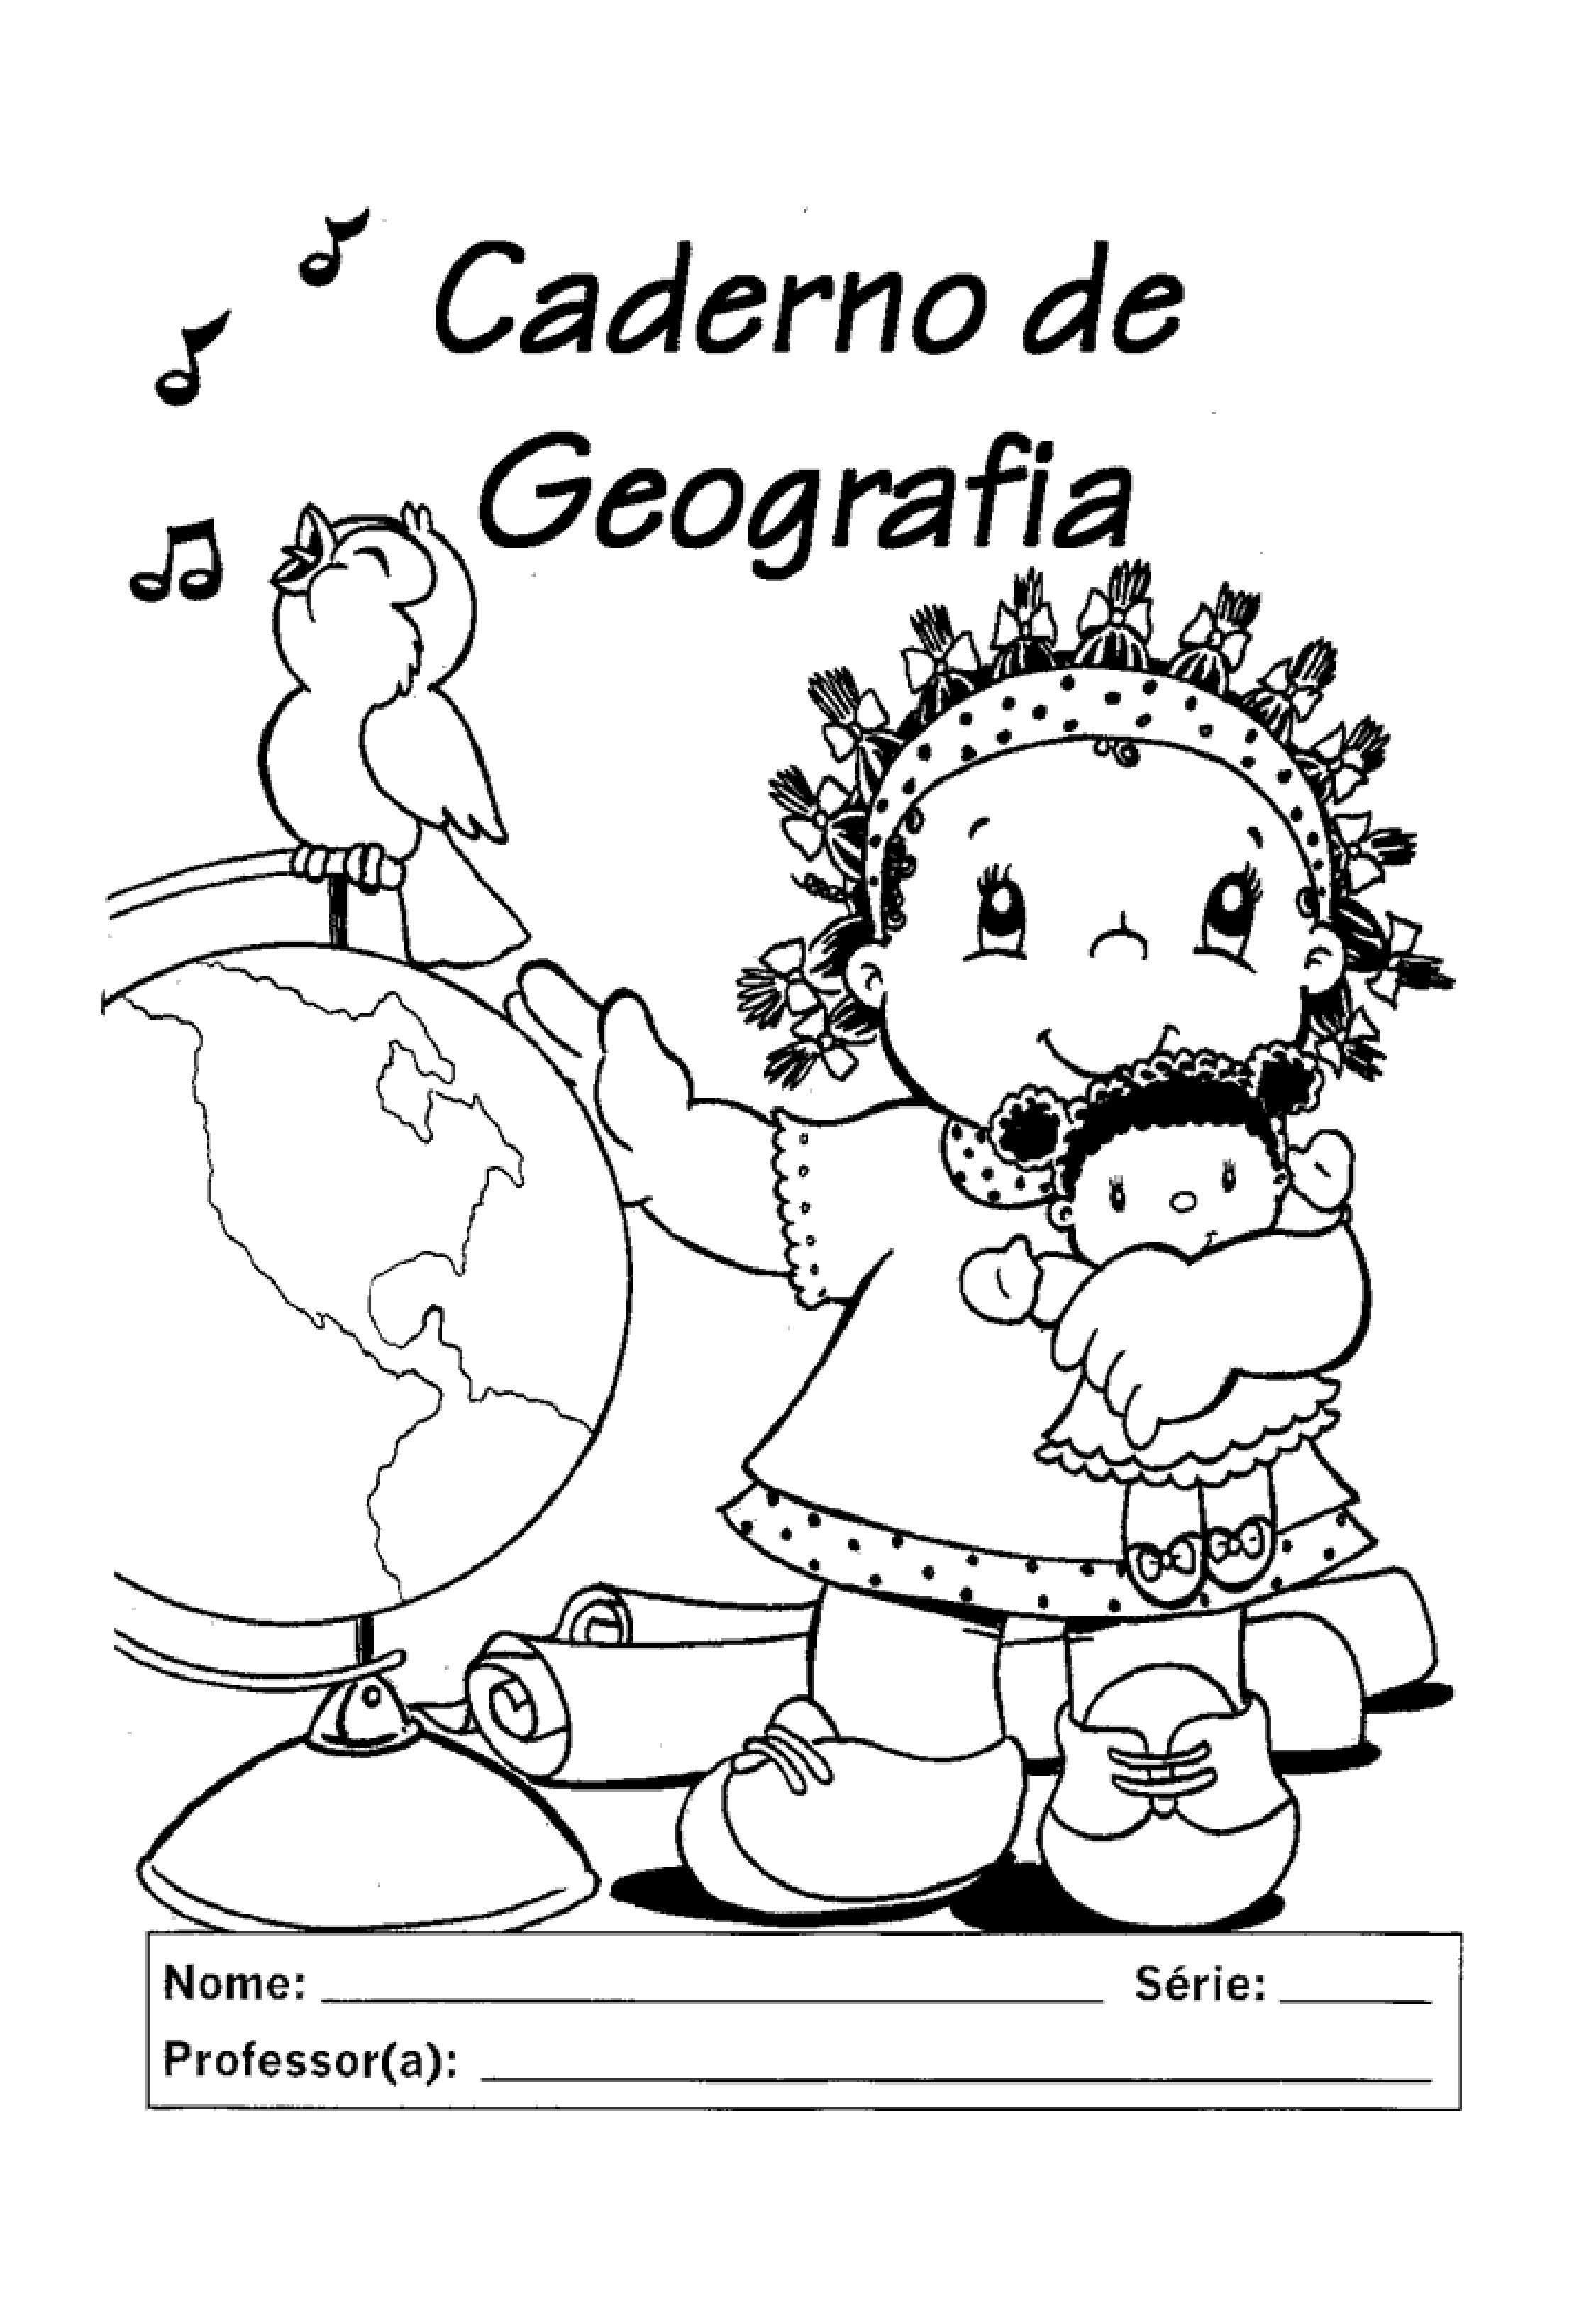 capa de caderno de geografia